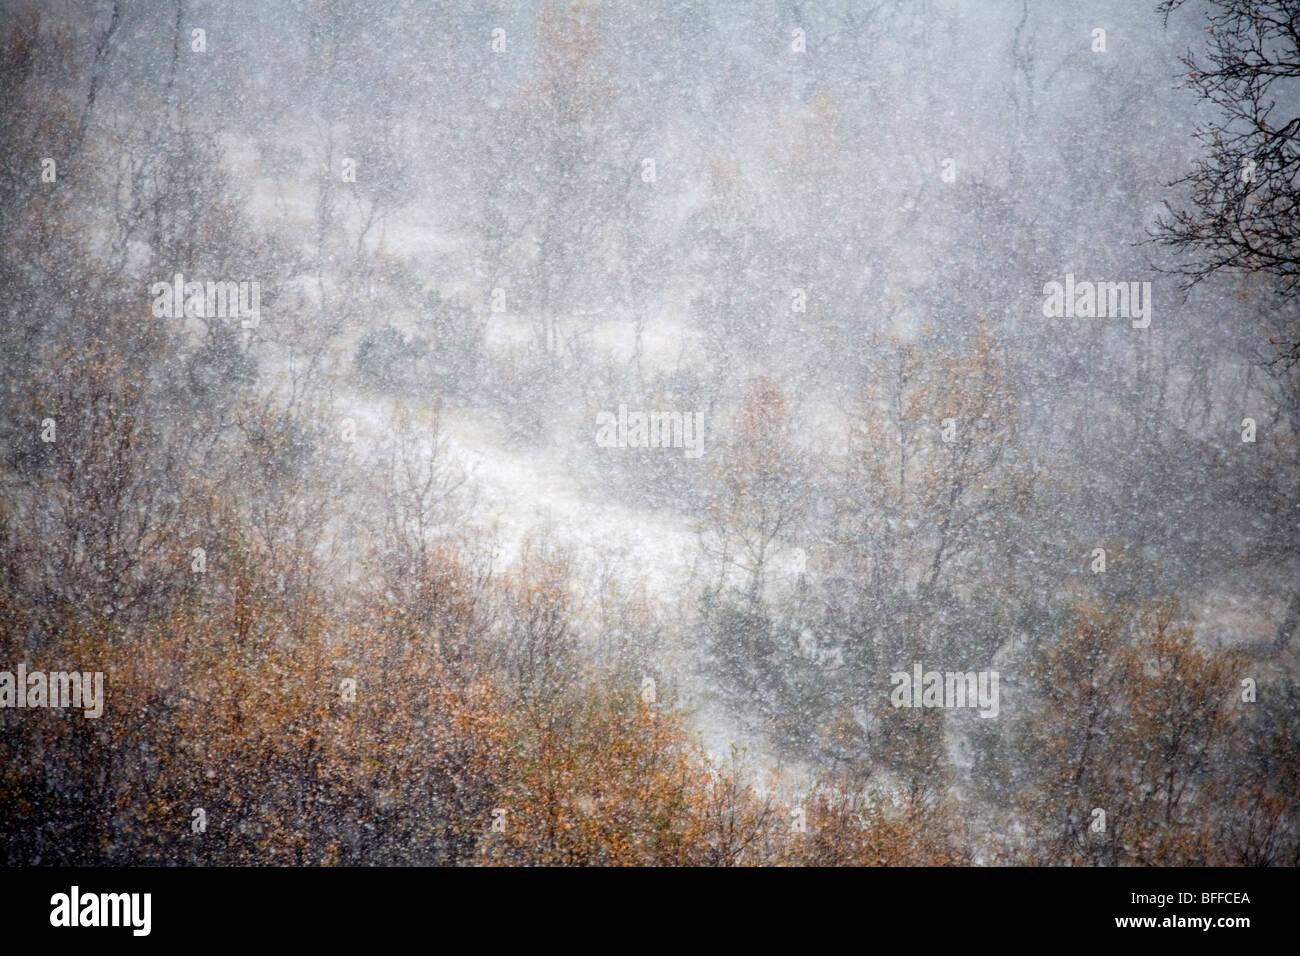 snowstorm snowfall - Stock Image